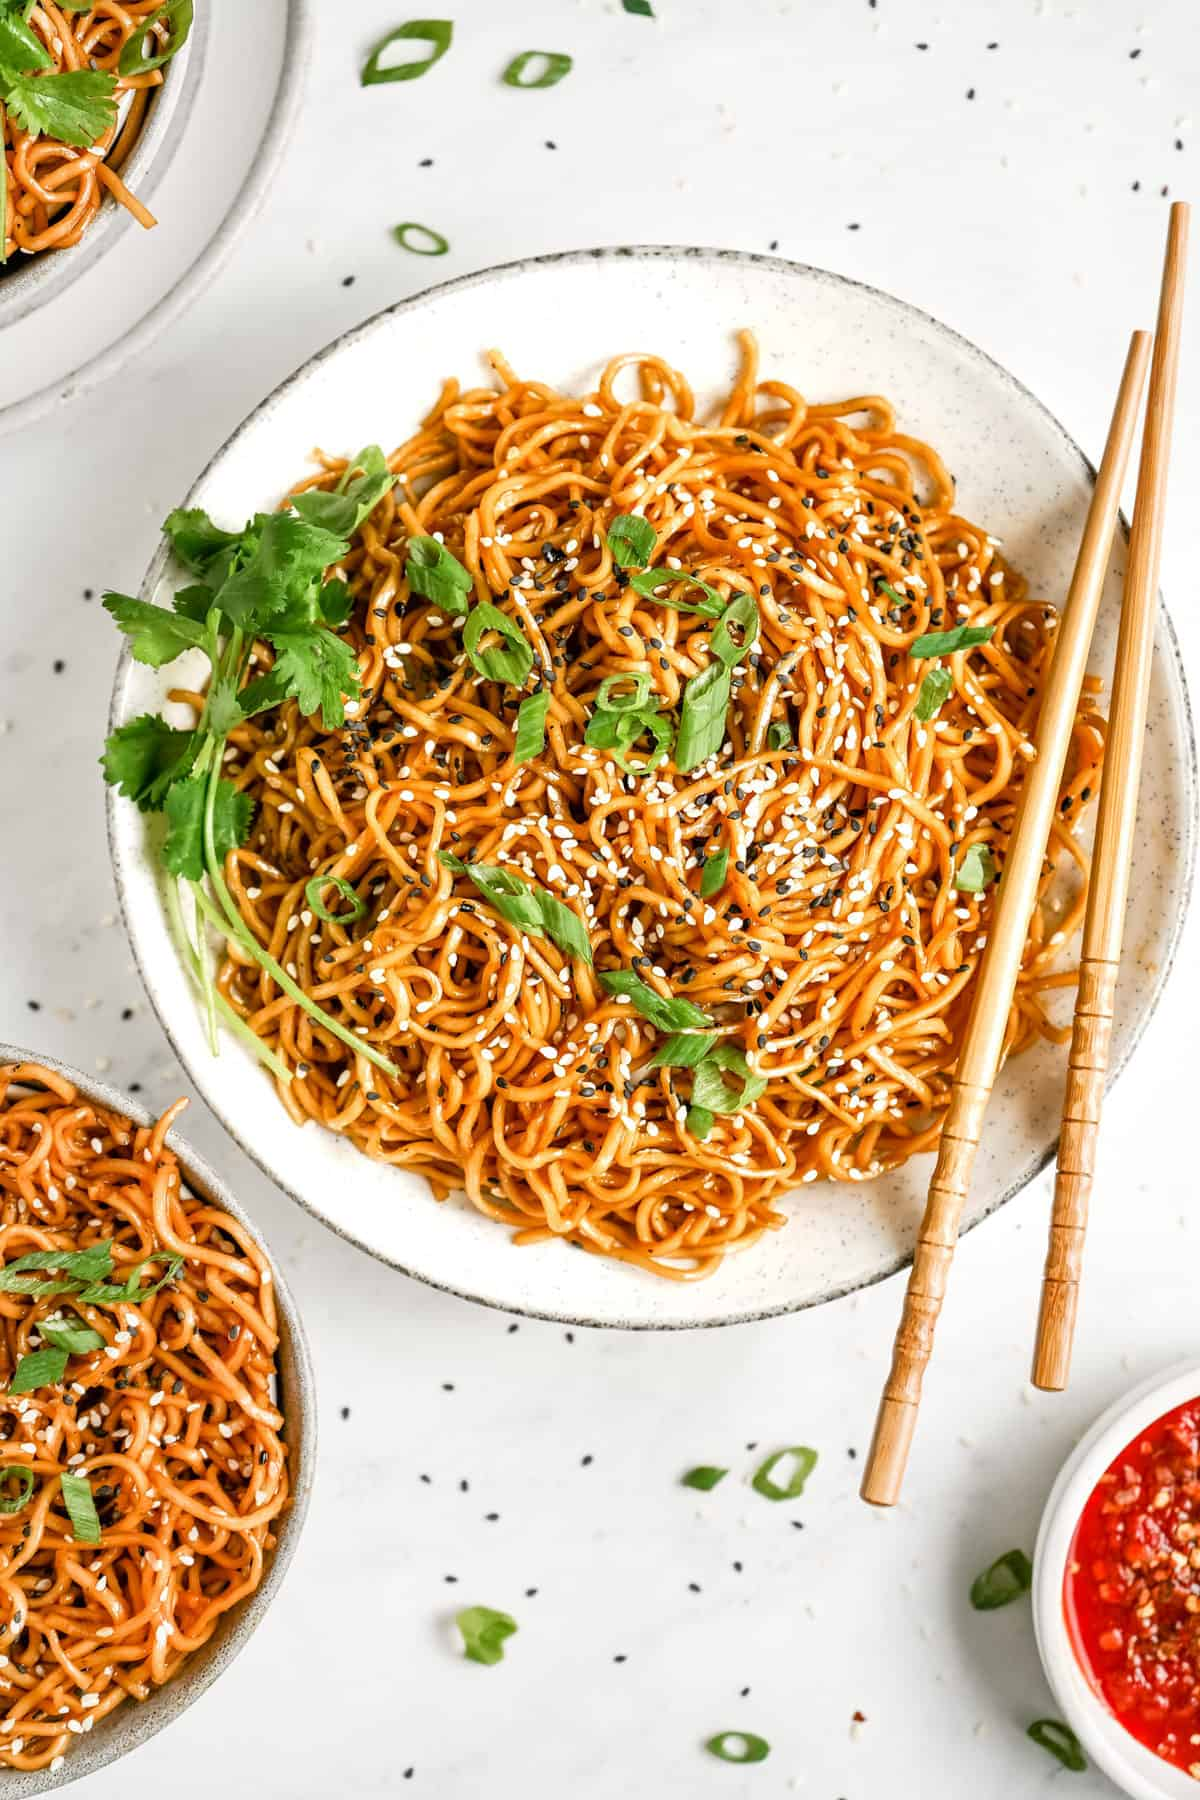 A plate of vegan sesame noodles with garnish.